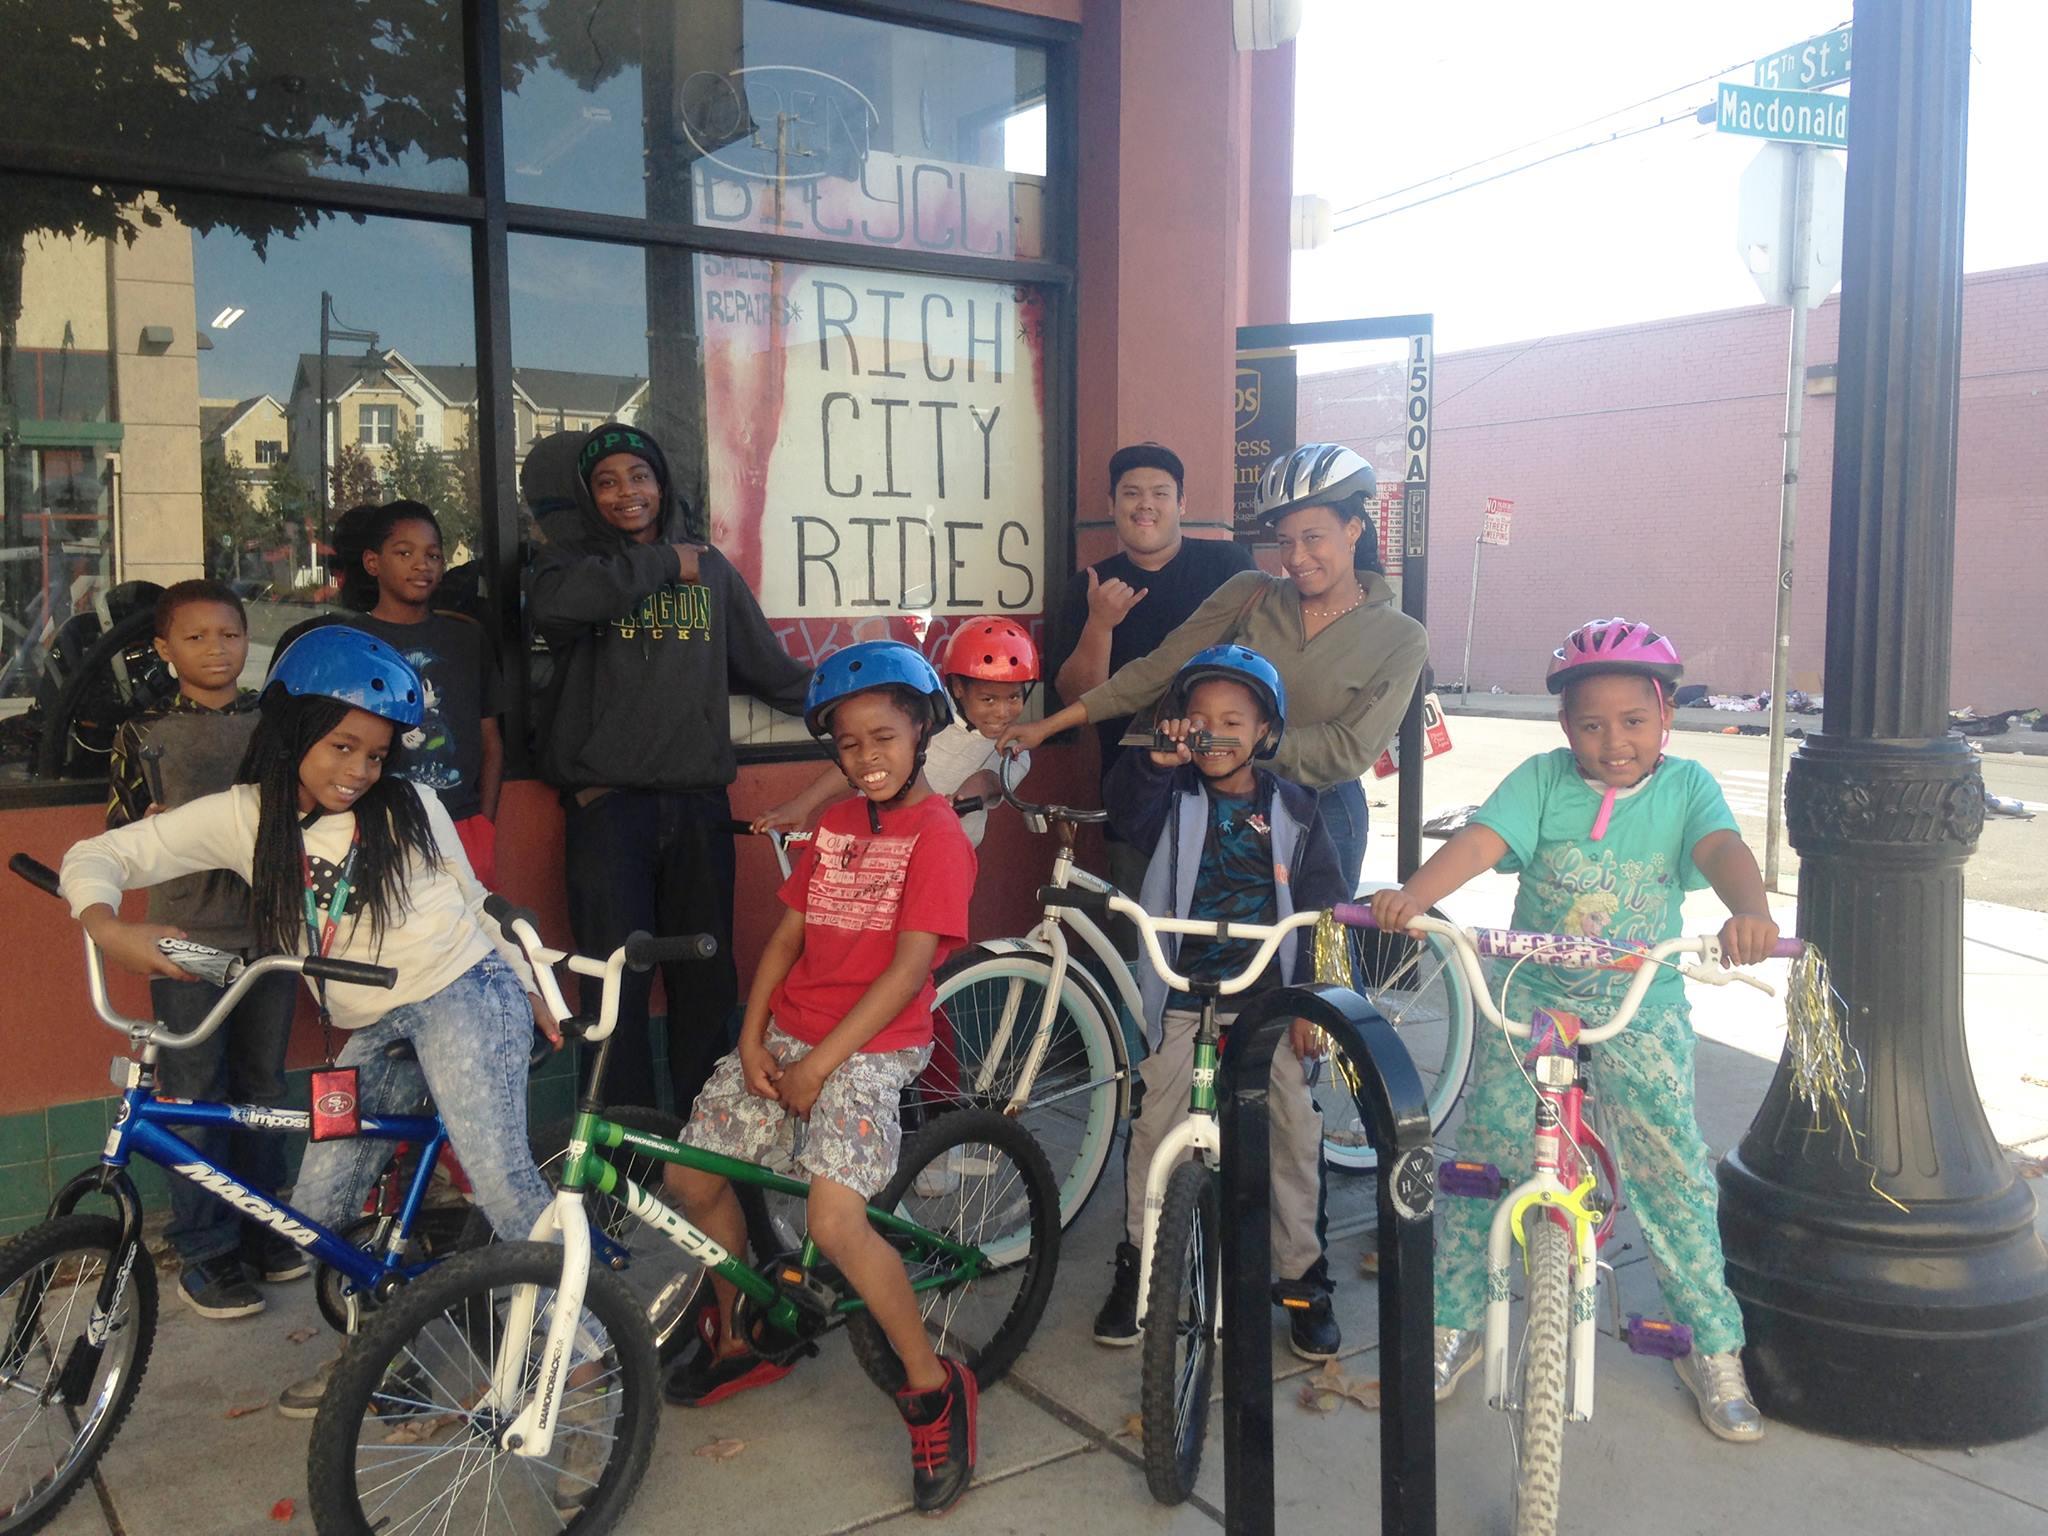 Rich_City_Rides.jpg